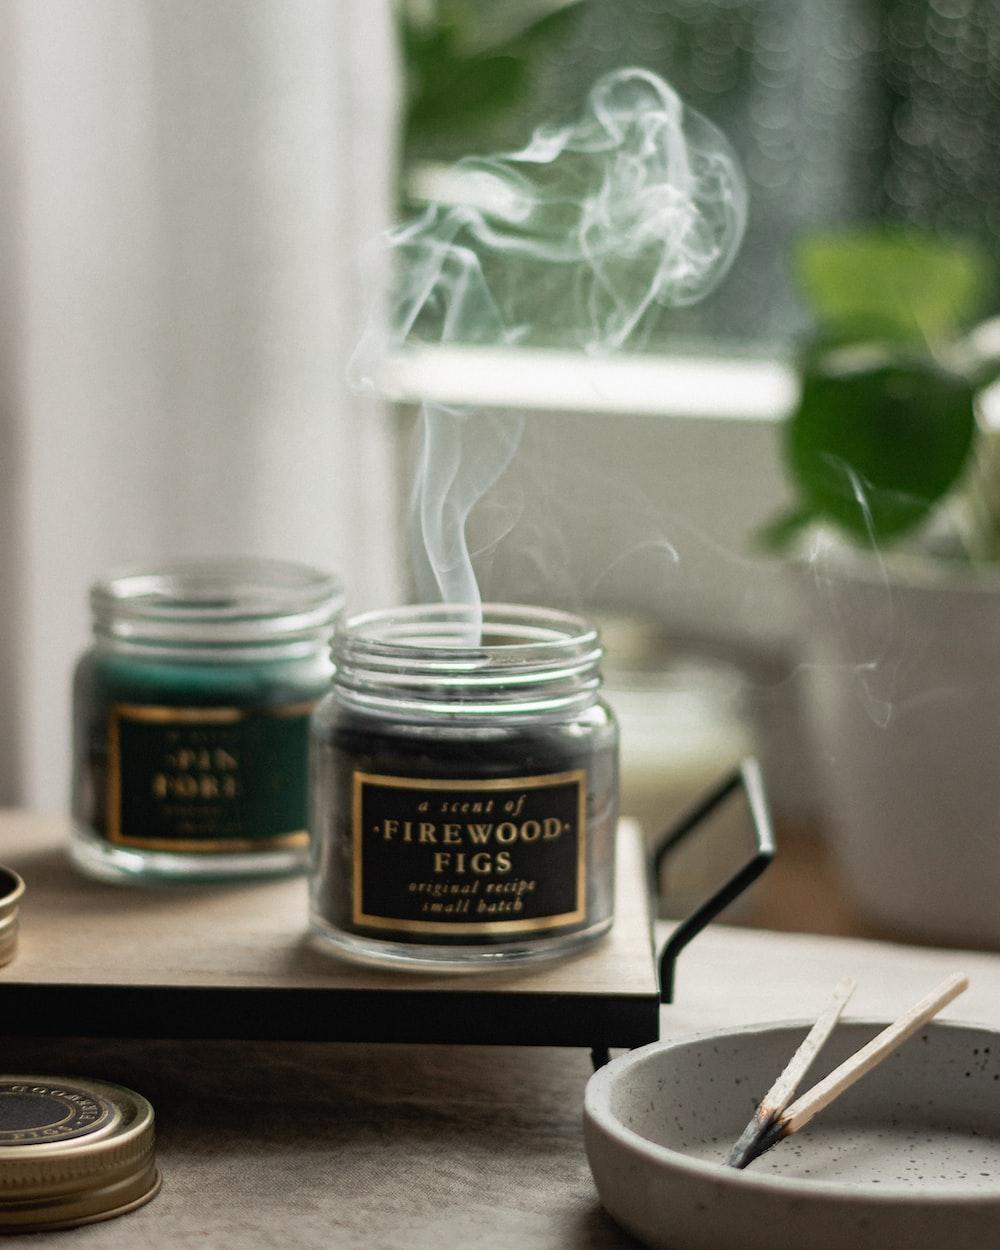 black and brown glass jar